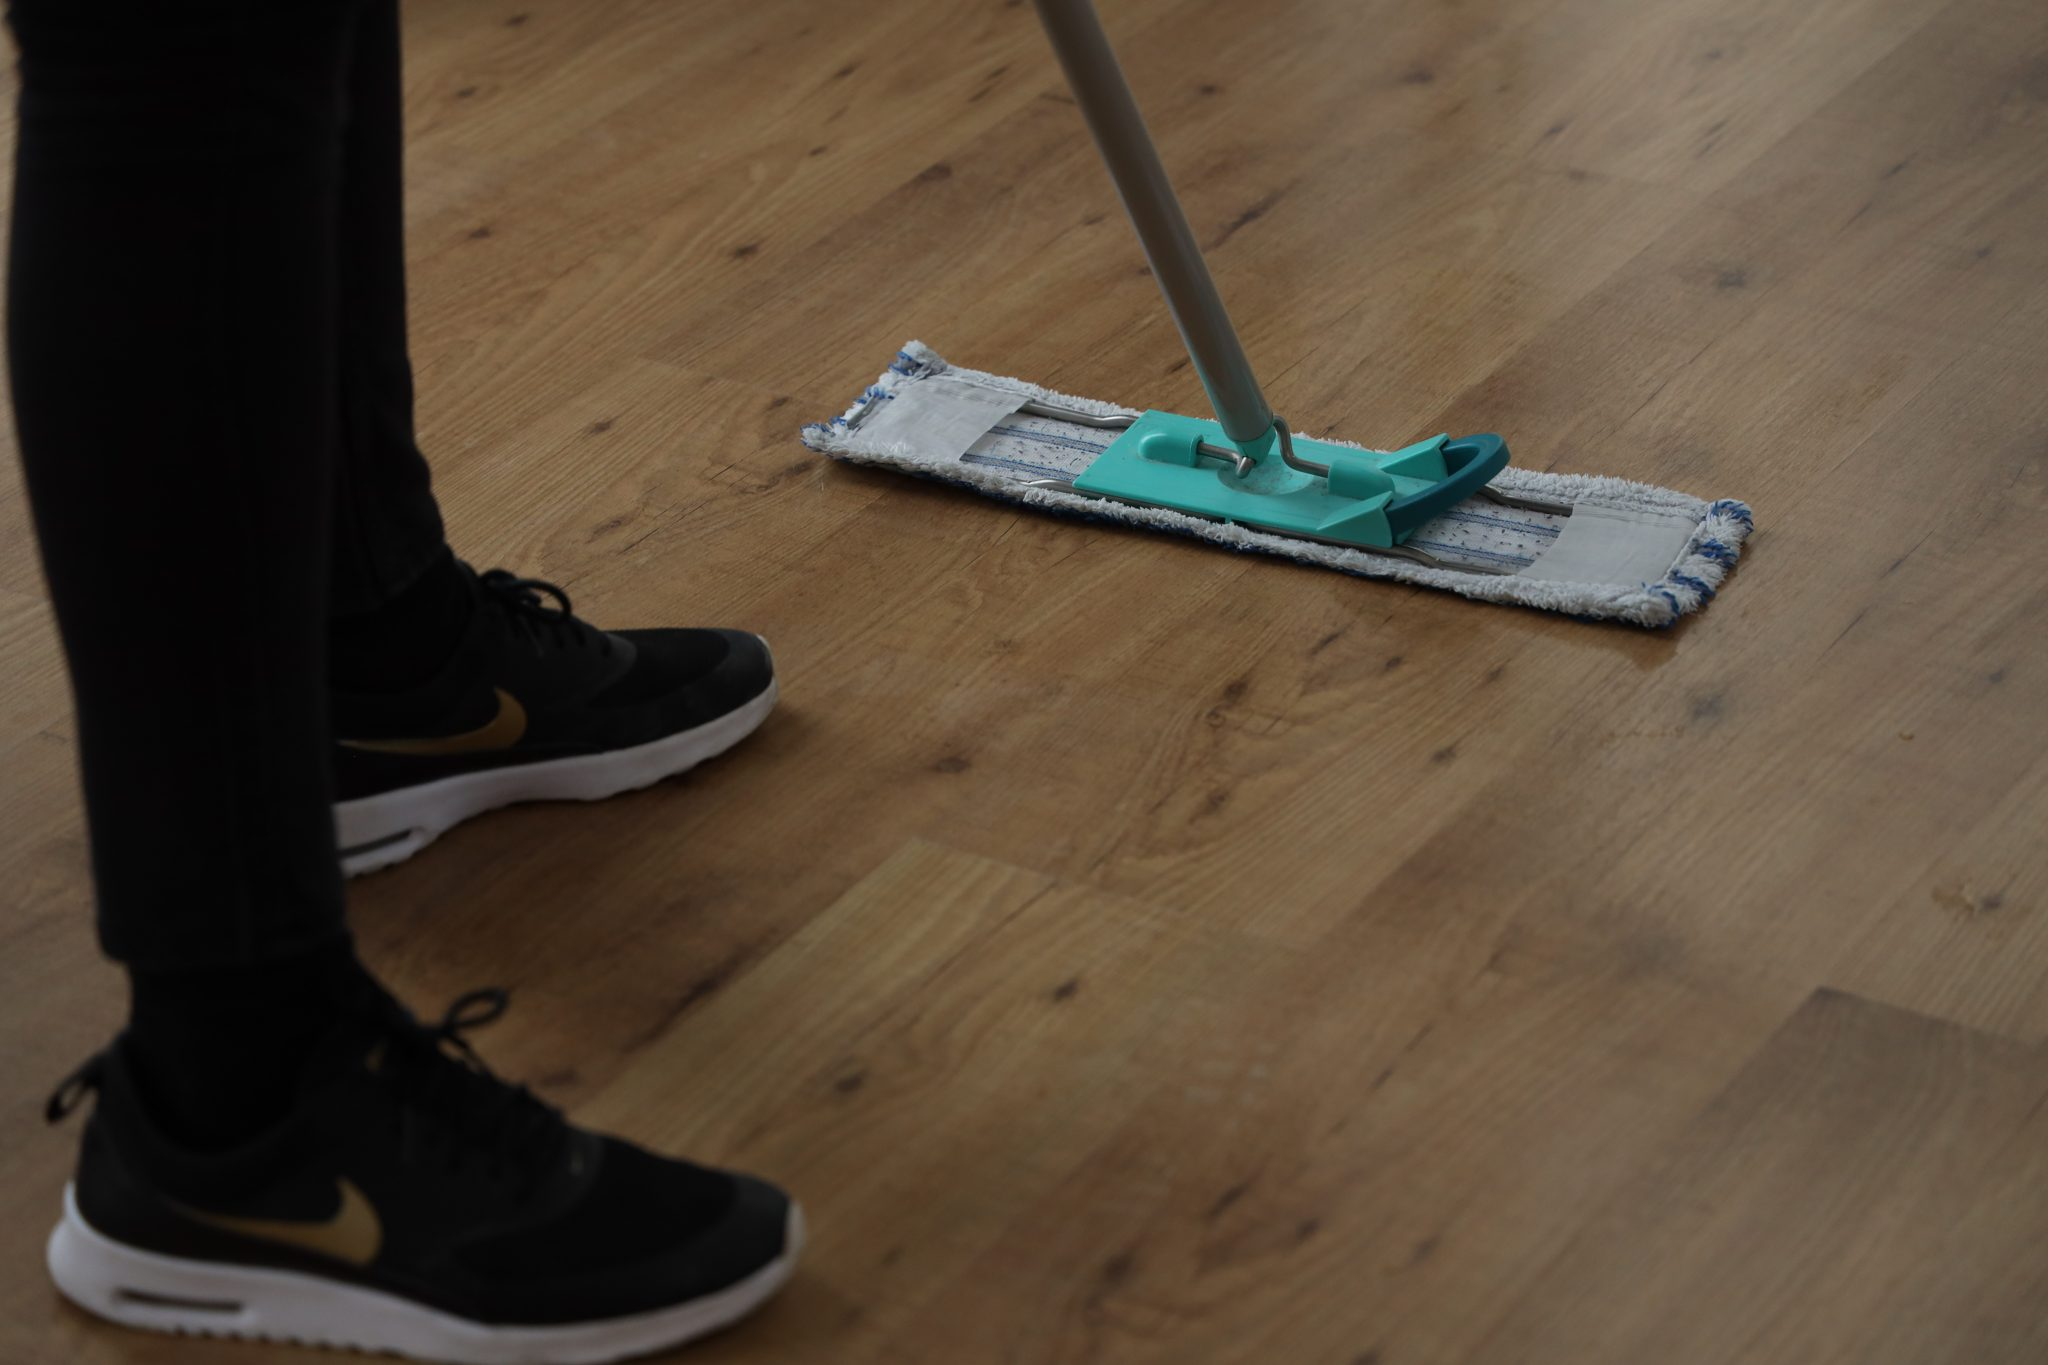 Laminaat dweilen met vloerwisser